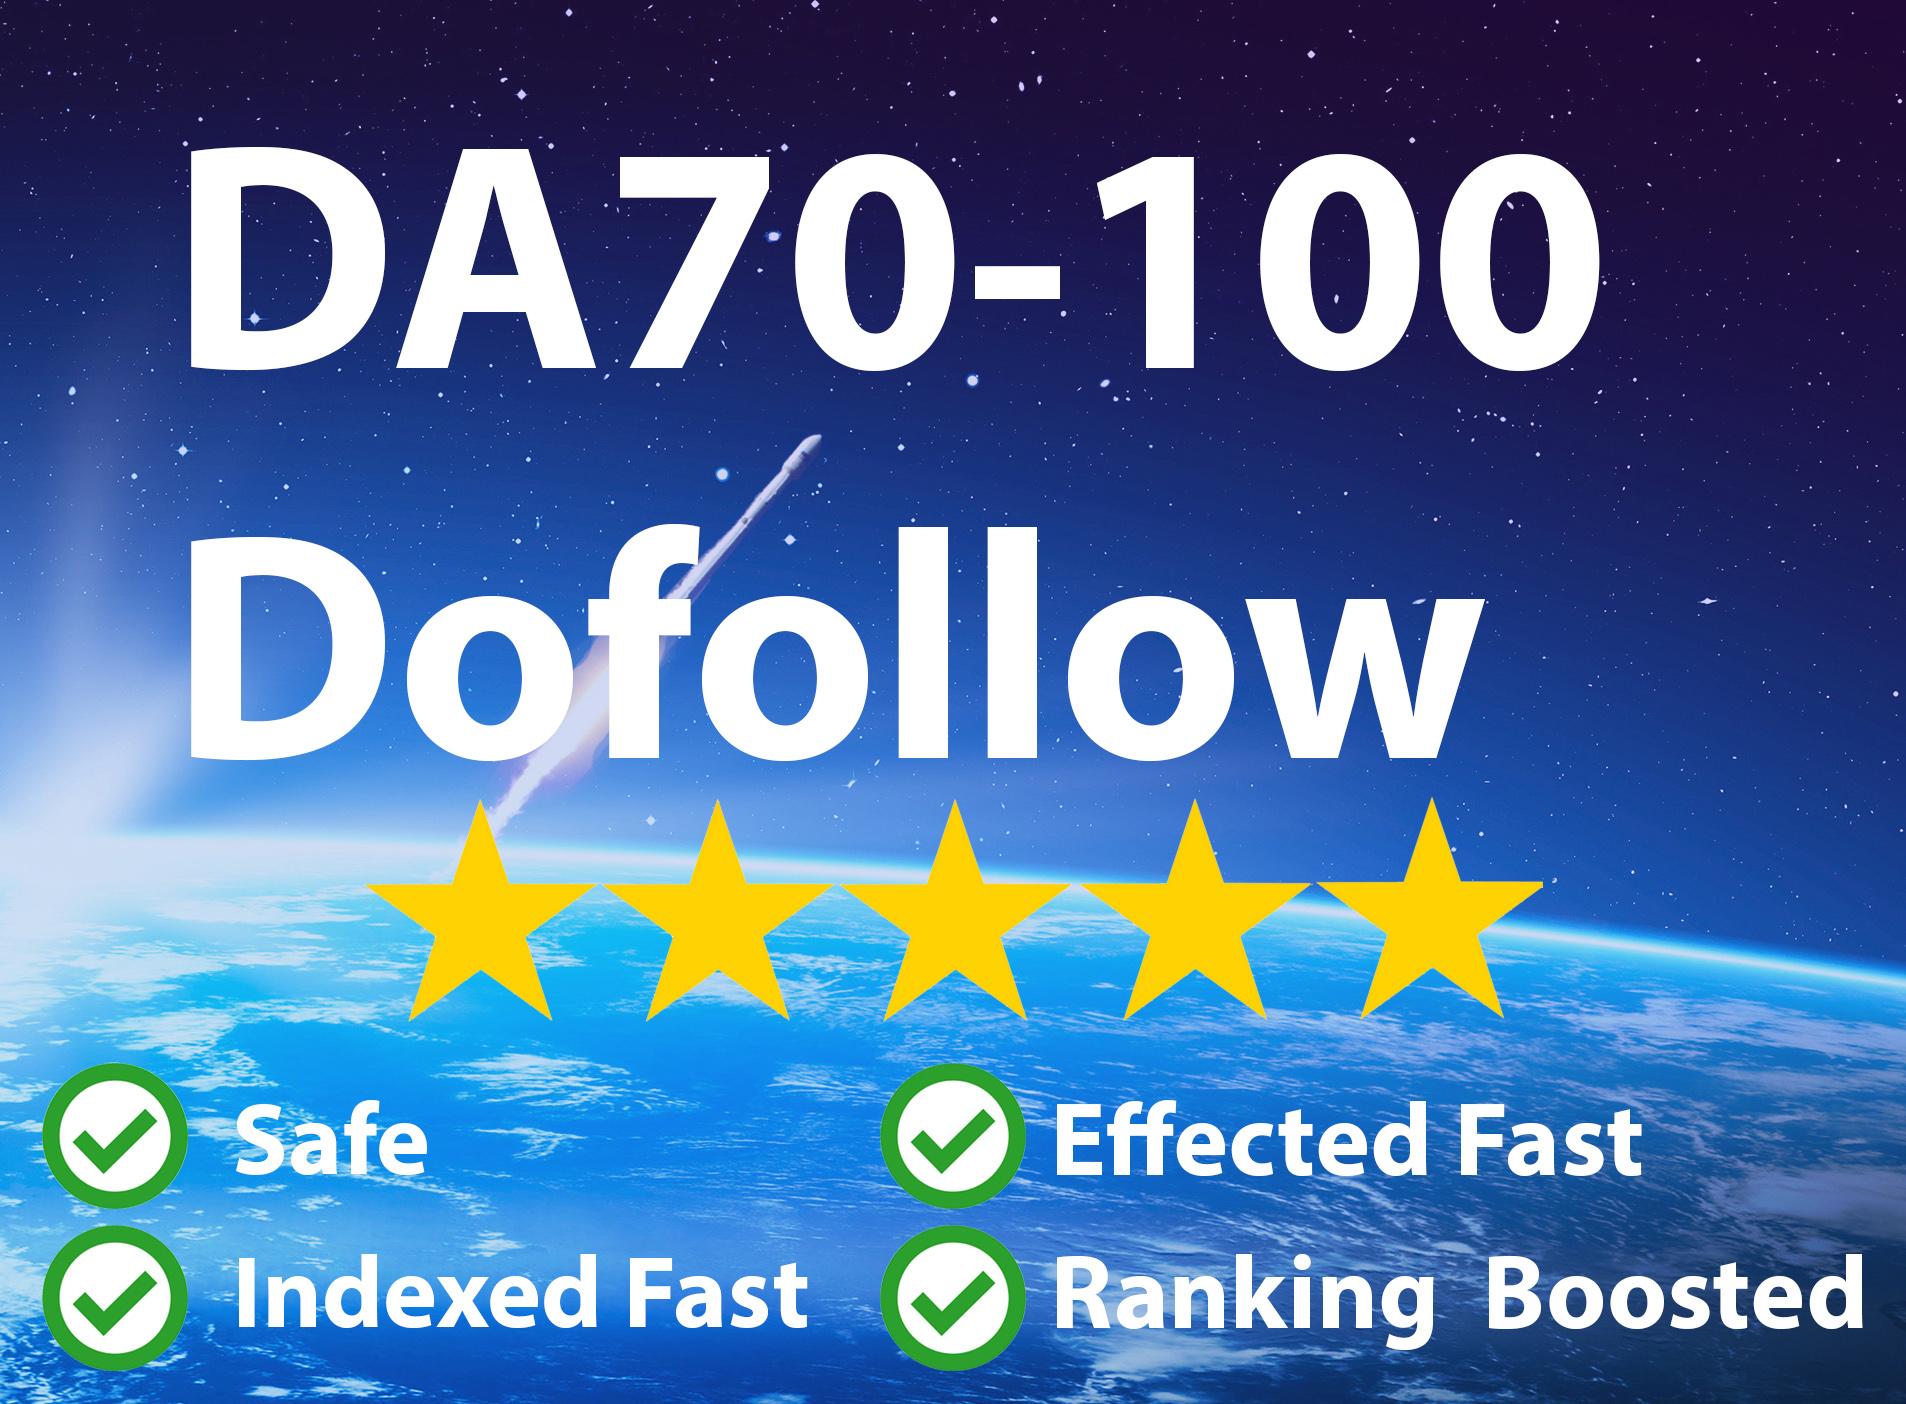 PR9-DA70+ Permanent Dofollow Backlink